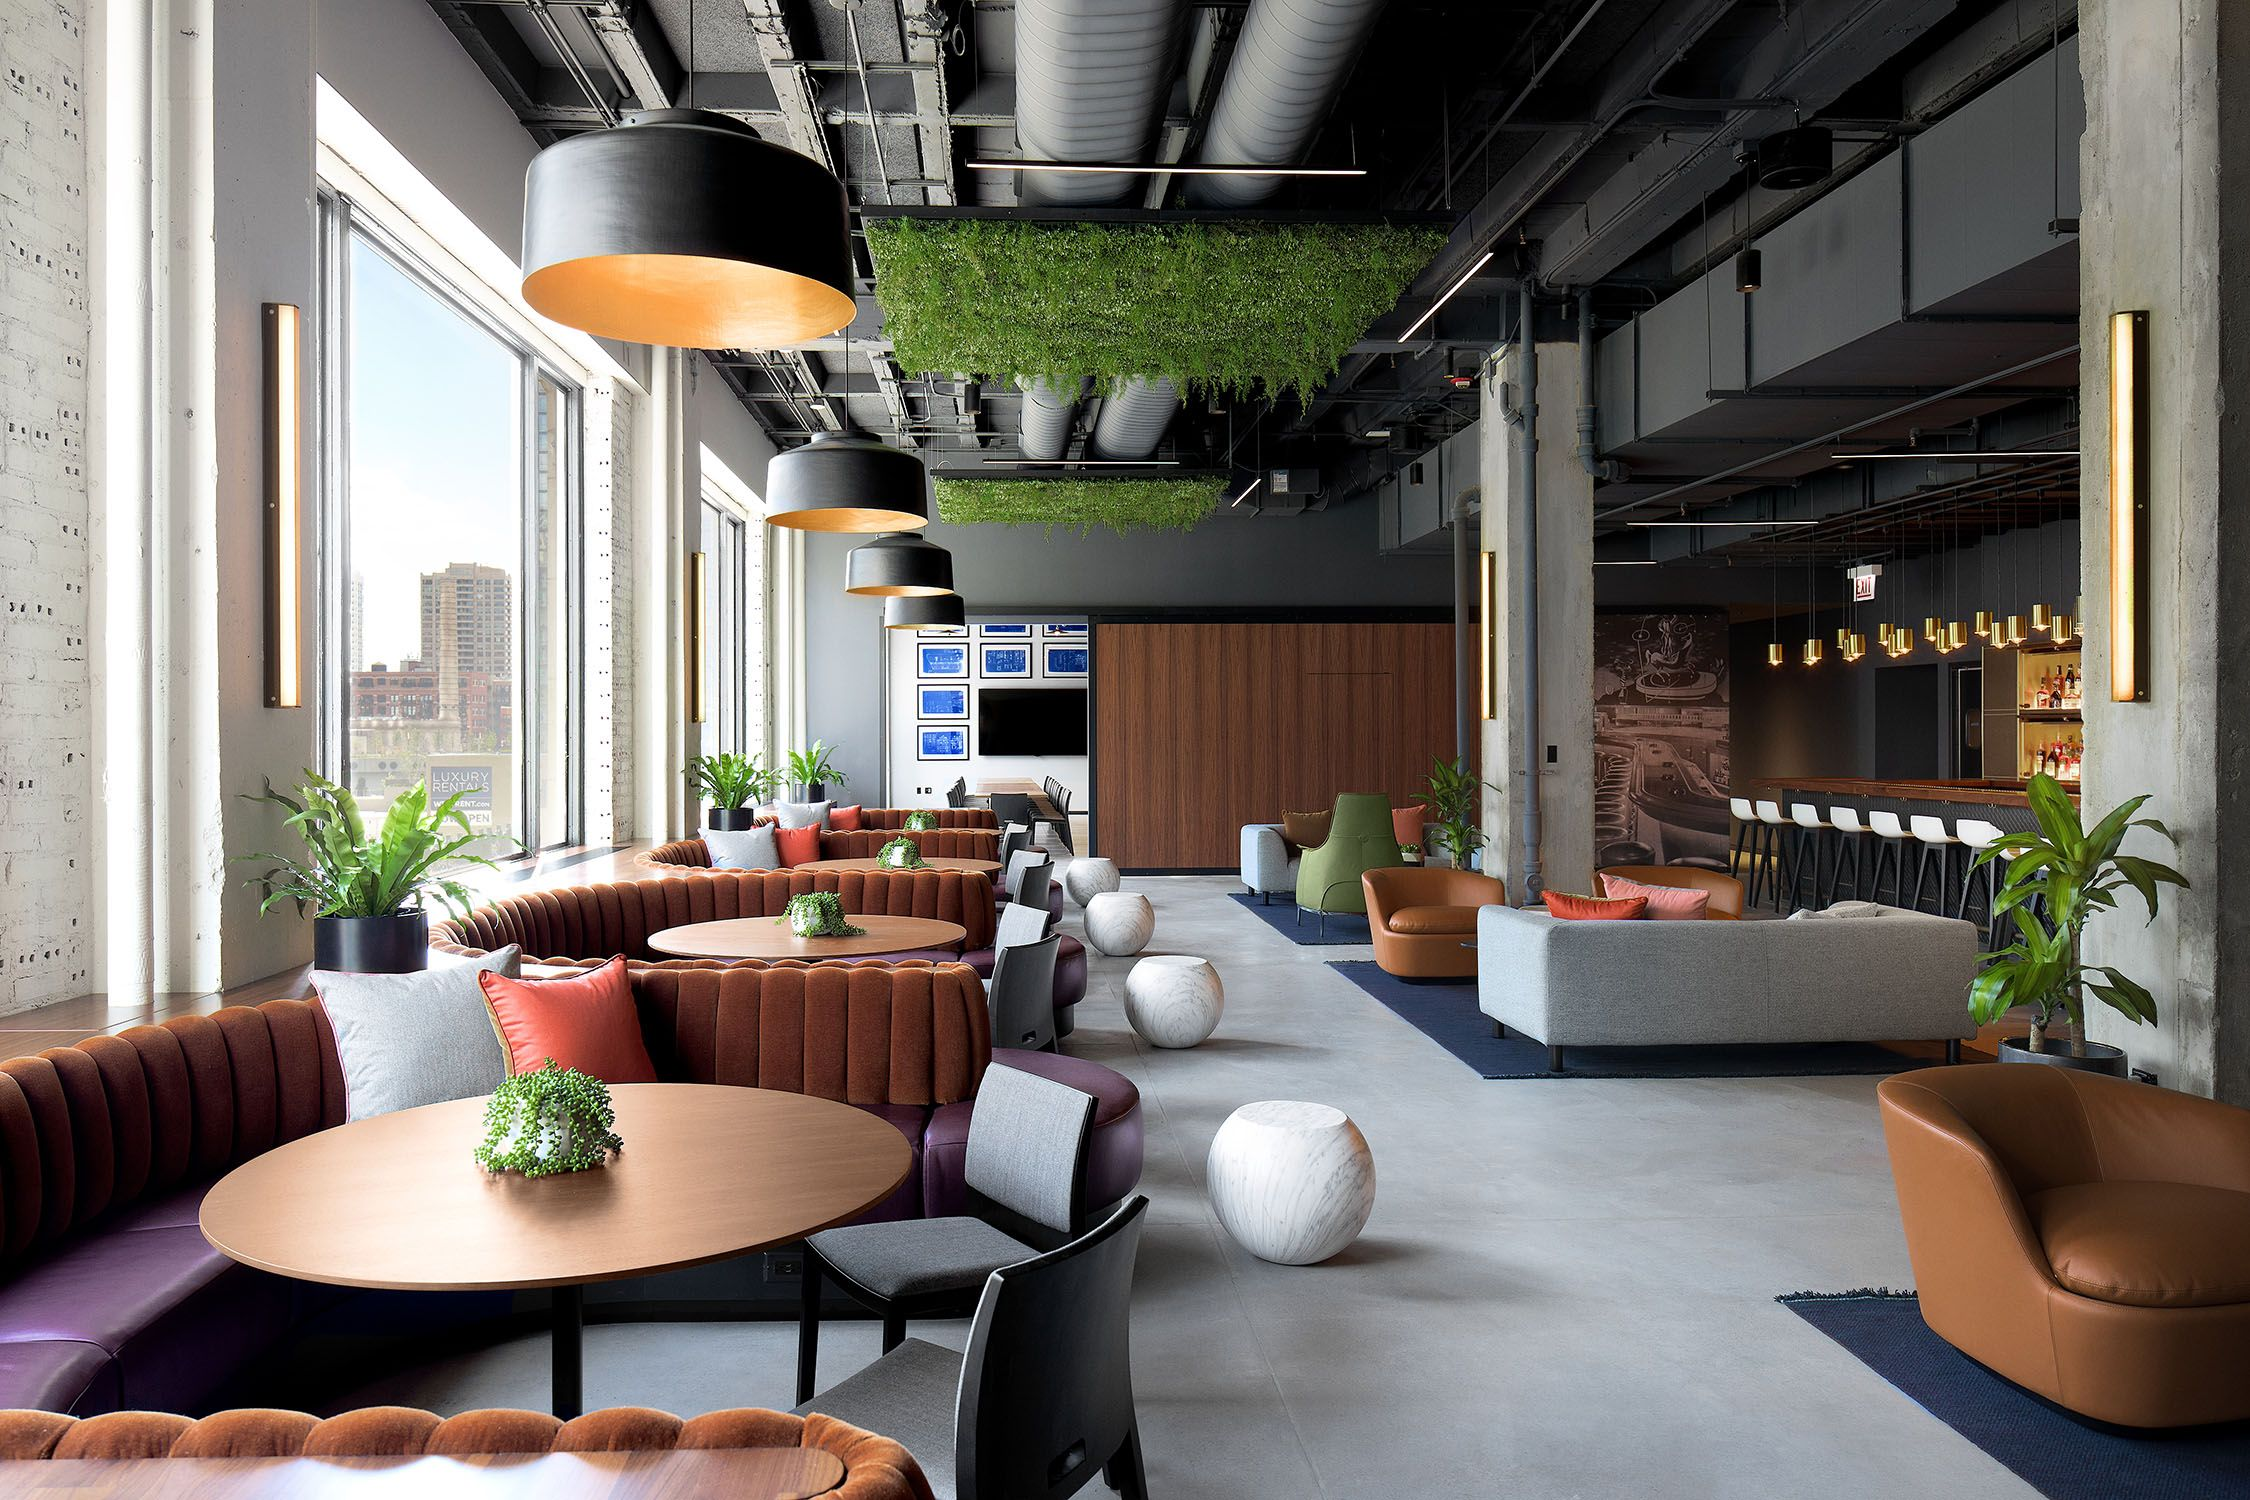 20170531 aplusi ml 0162 b v5 jpg y5 pinterest design firms rh pinterest com commercial interior design firms chicago il commercial interior design firms chicago